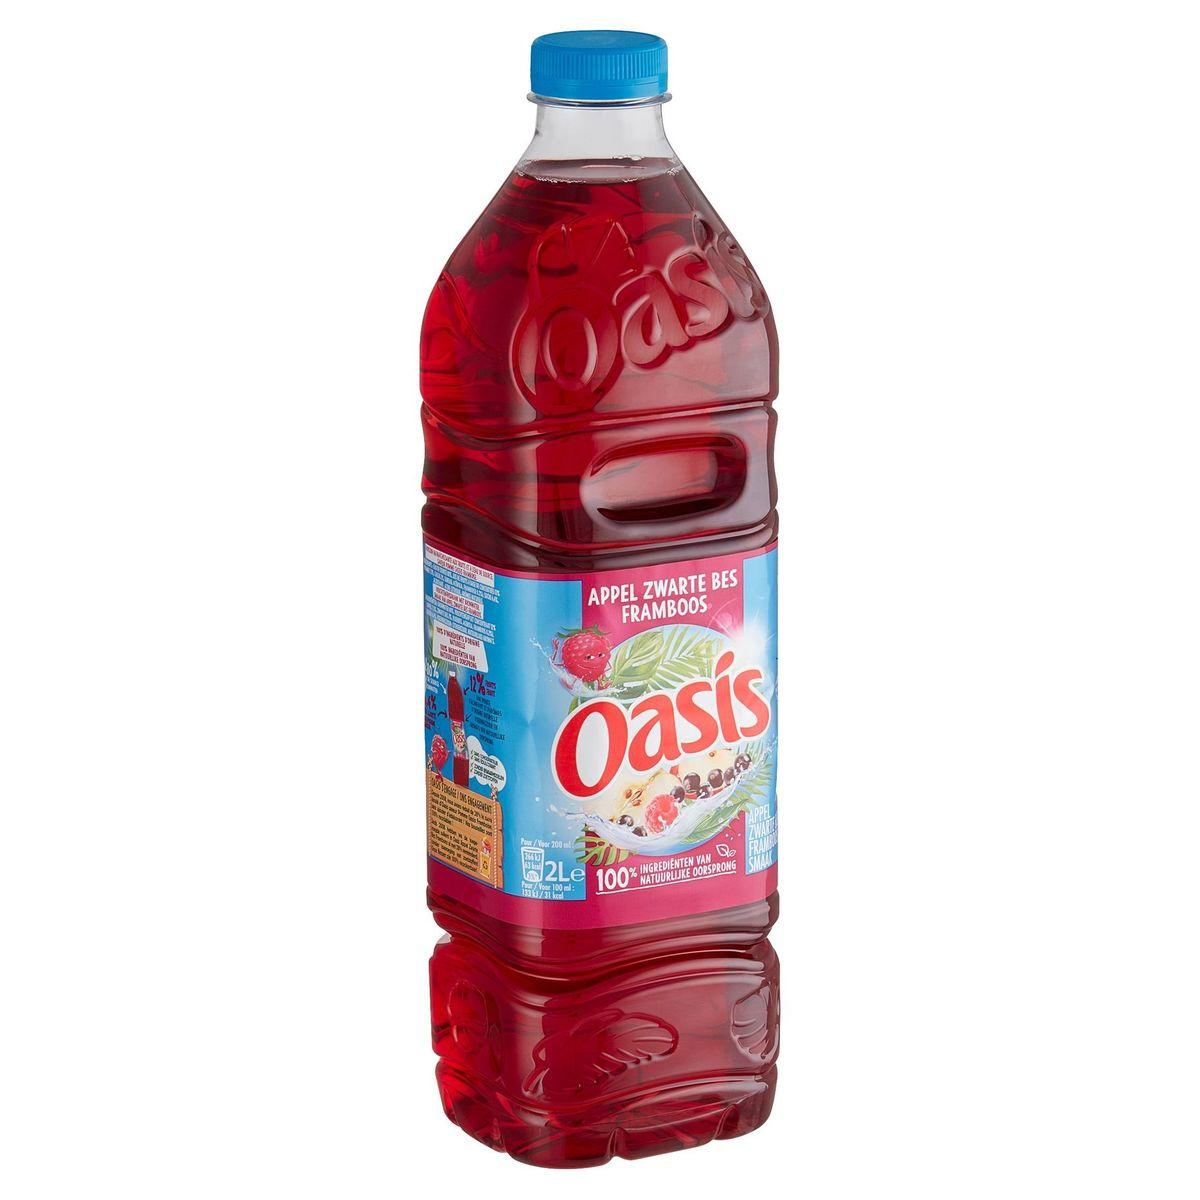 Oasis Appel Zwarte Bes Framboos 2 L